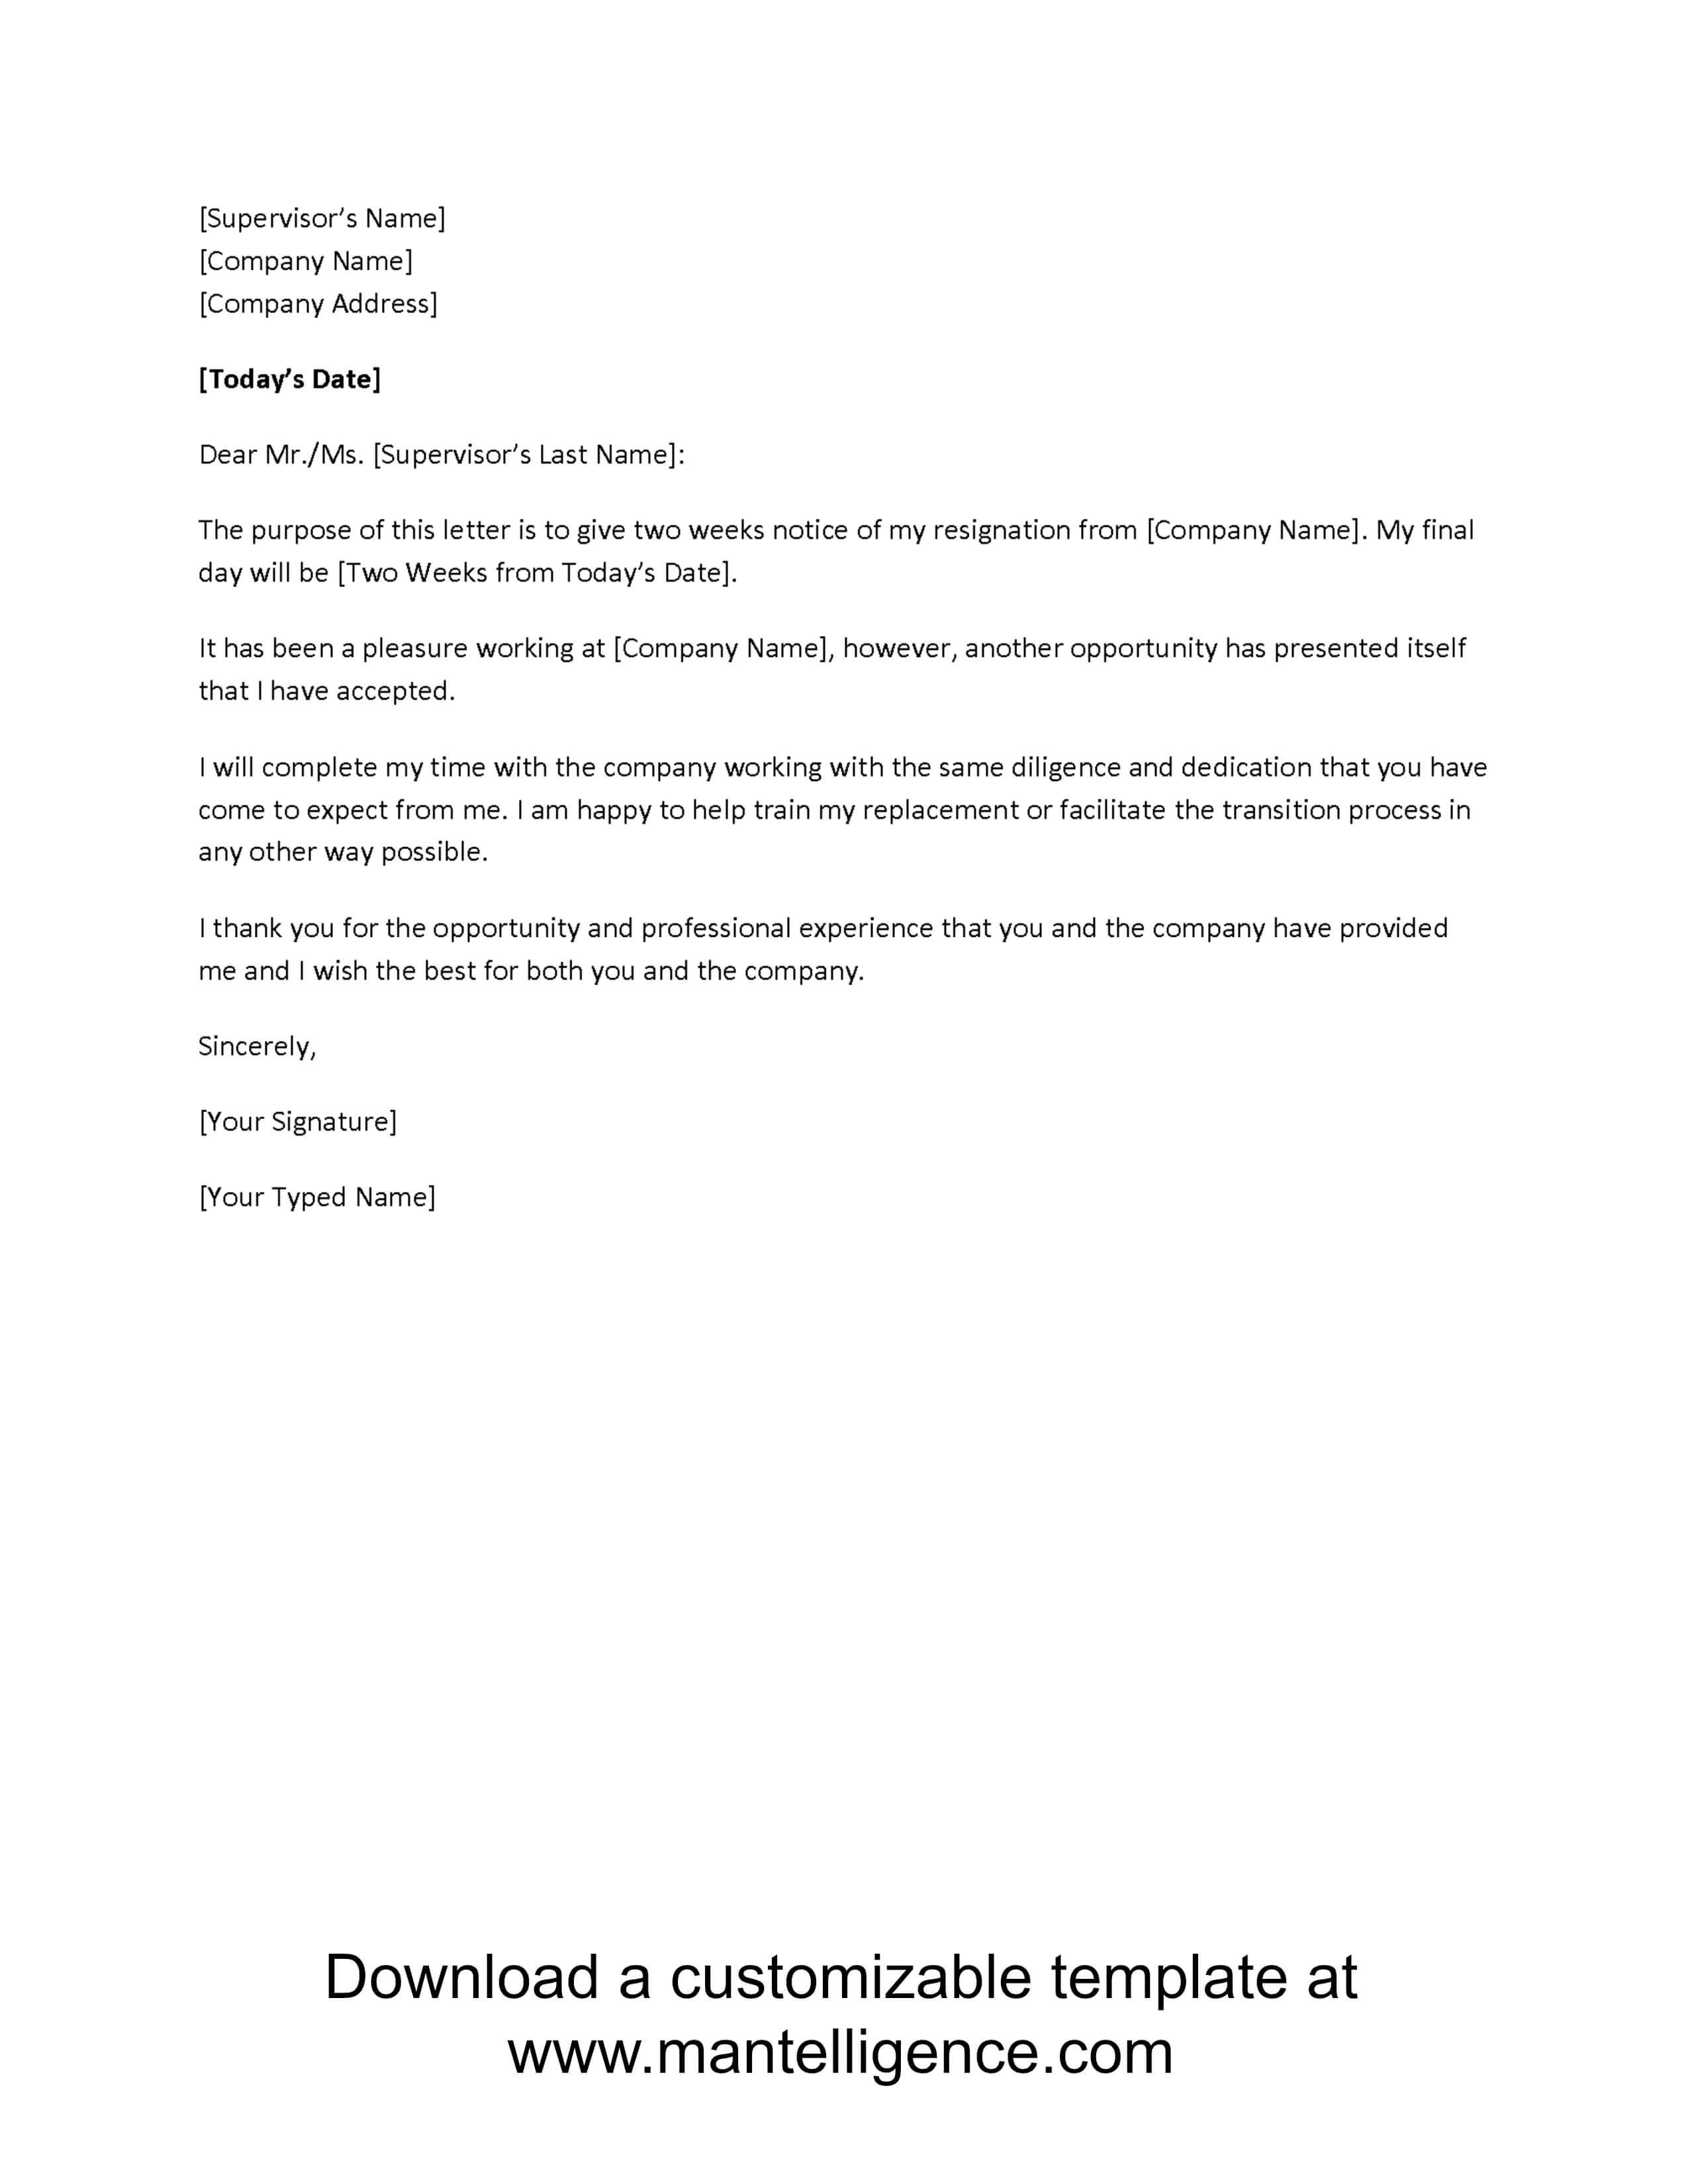 001 Week Notice Letter Template Ideas Incredible 2 Simple throughout 2 Weeks Notice Template Word